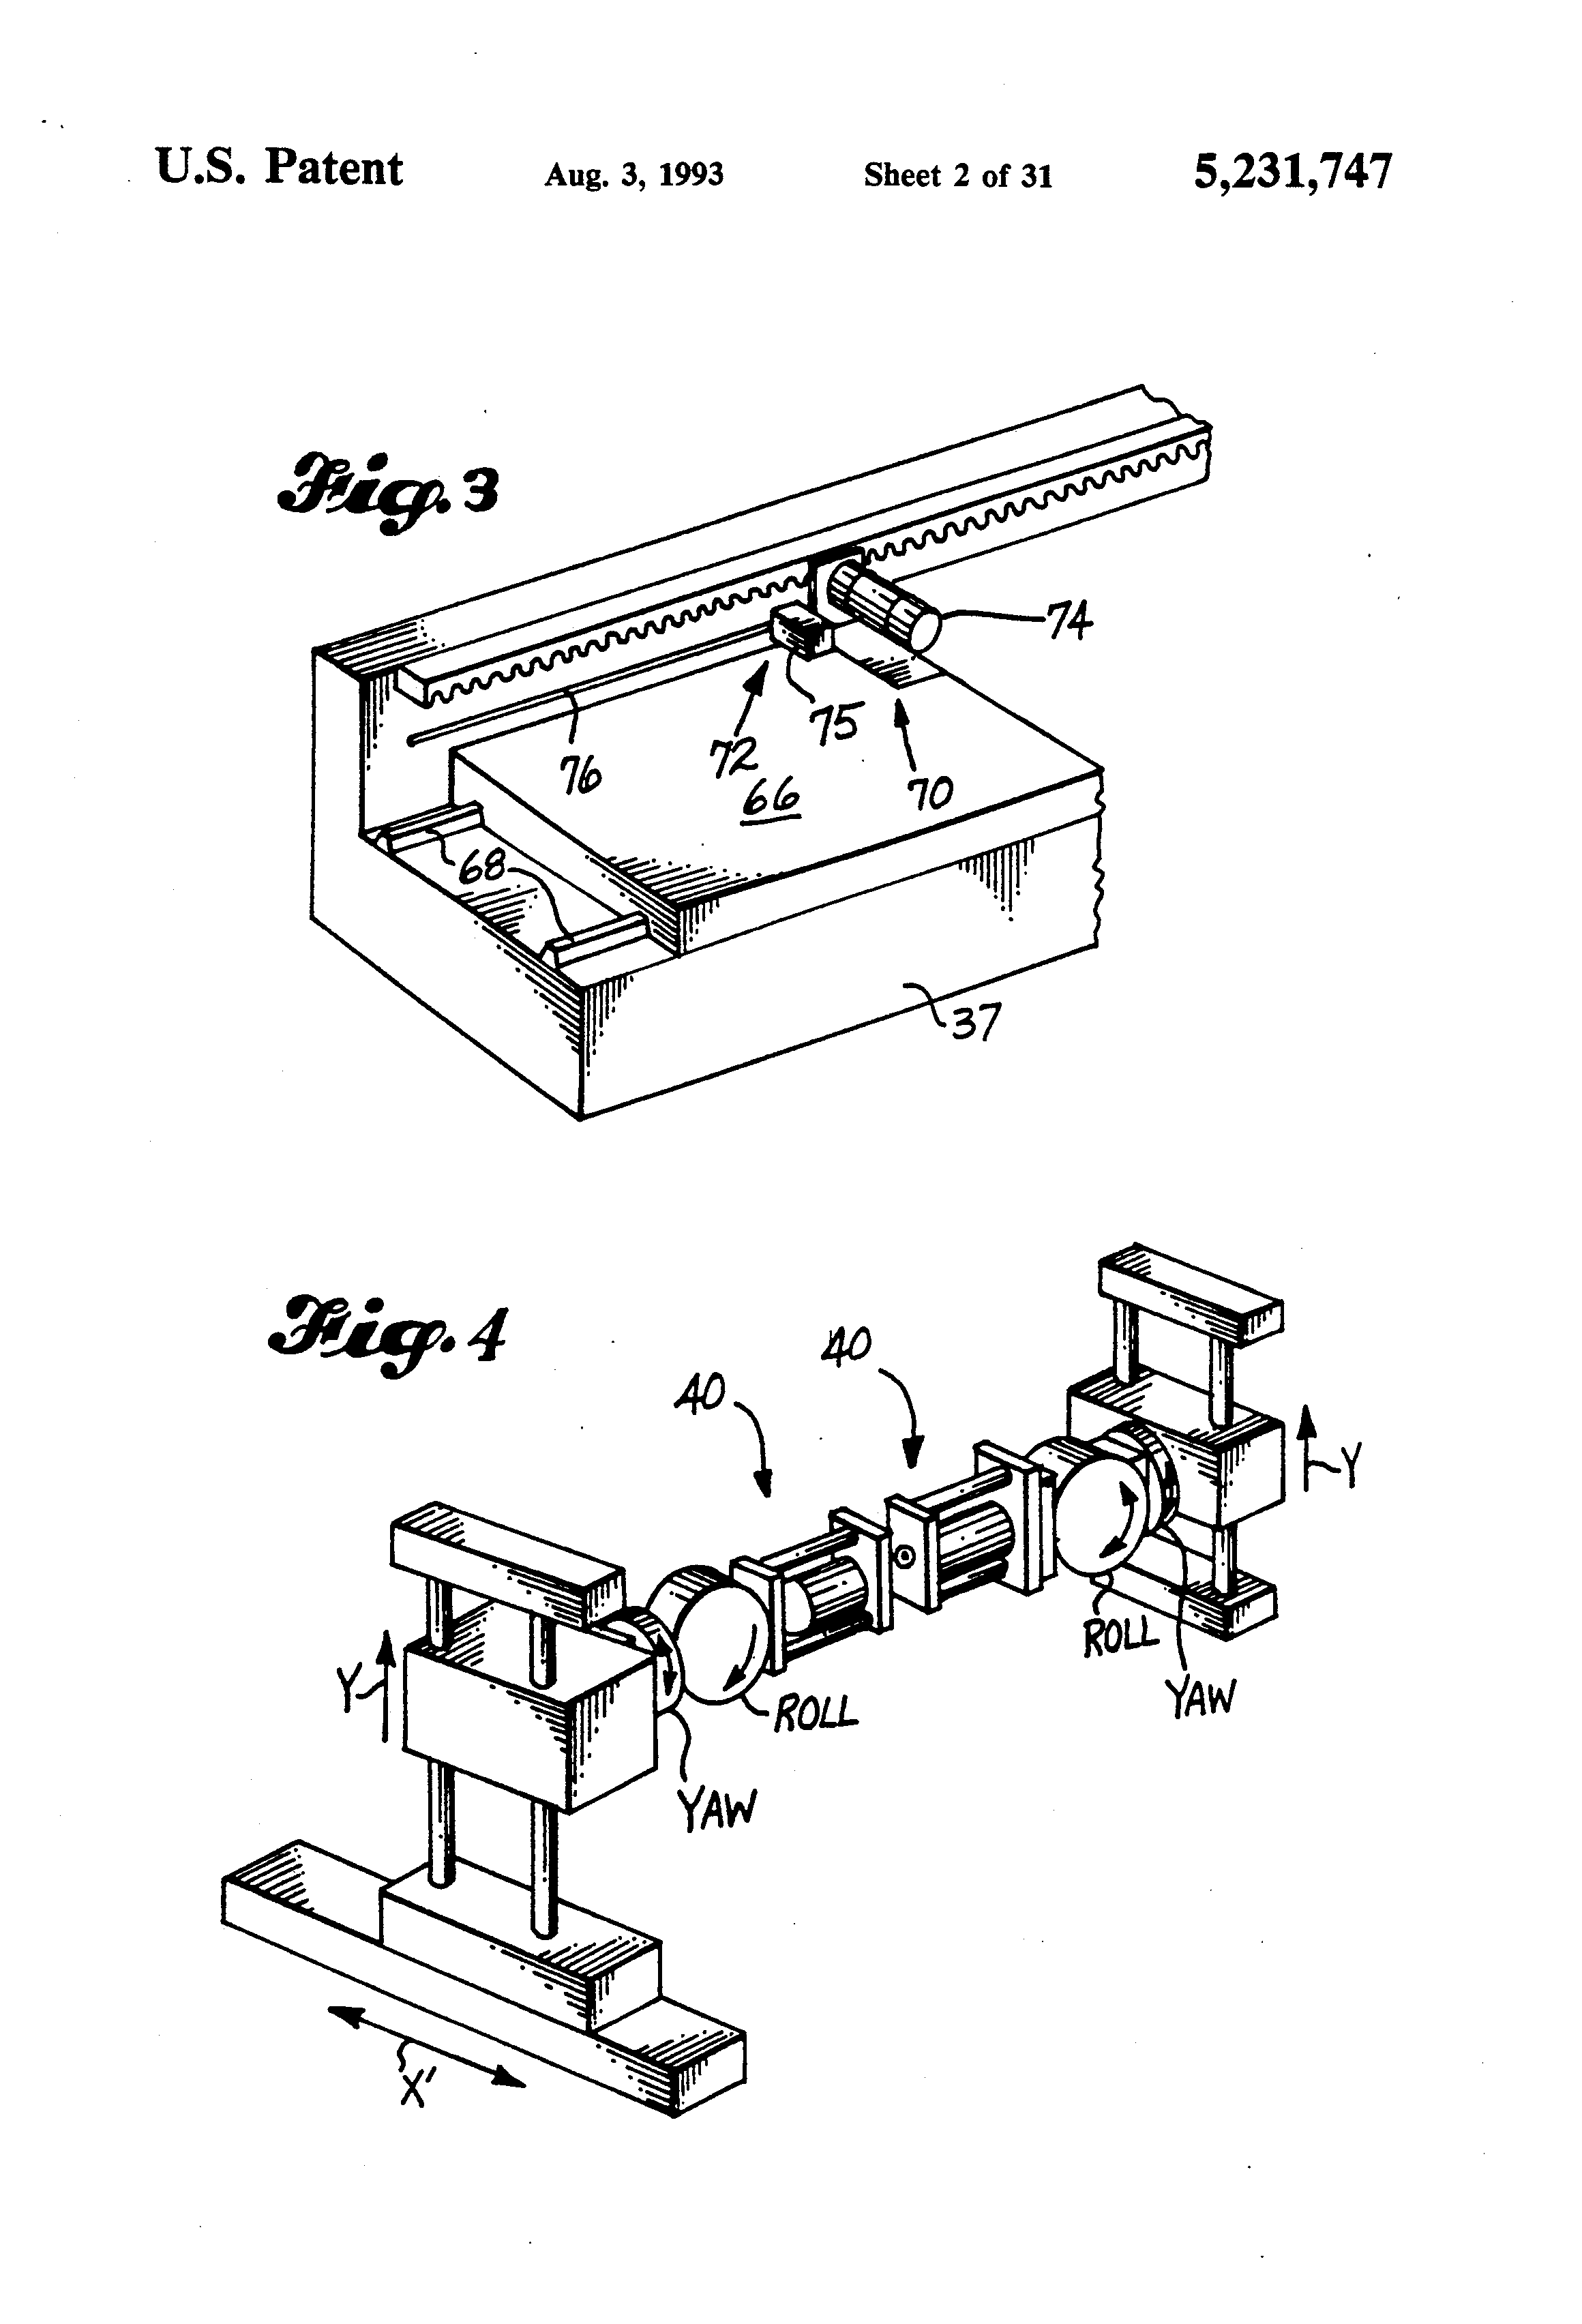 US5231747 3 sundowner horse trailer wiring diagram tractor repair with,Sundowner Wiring Diagrams